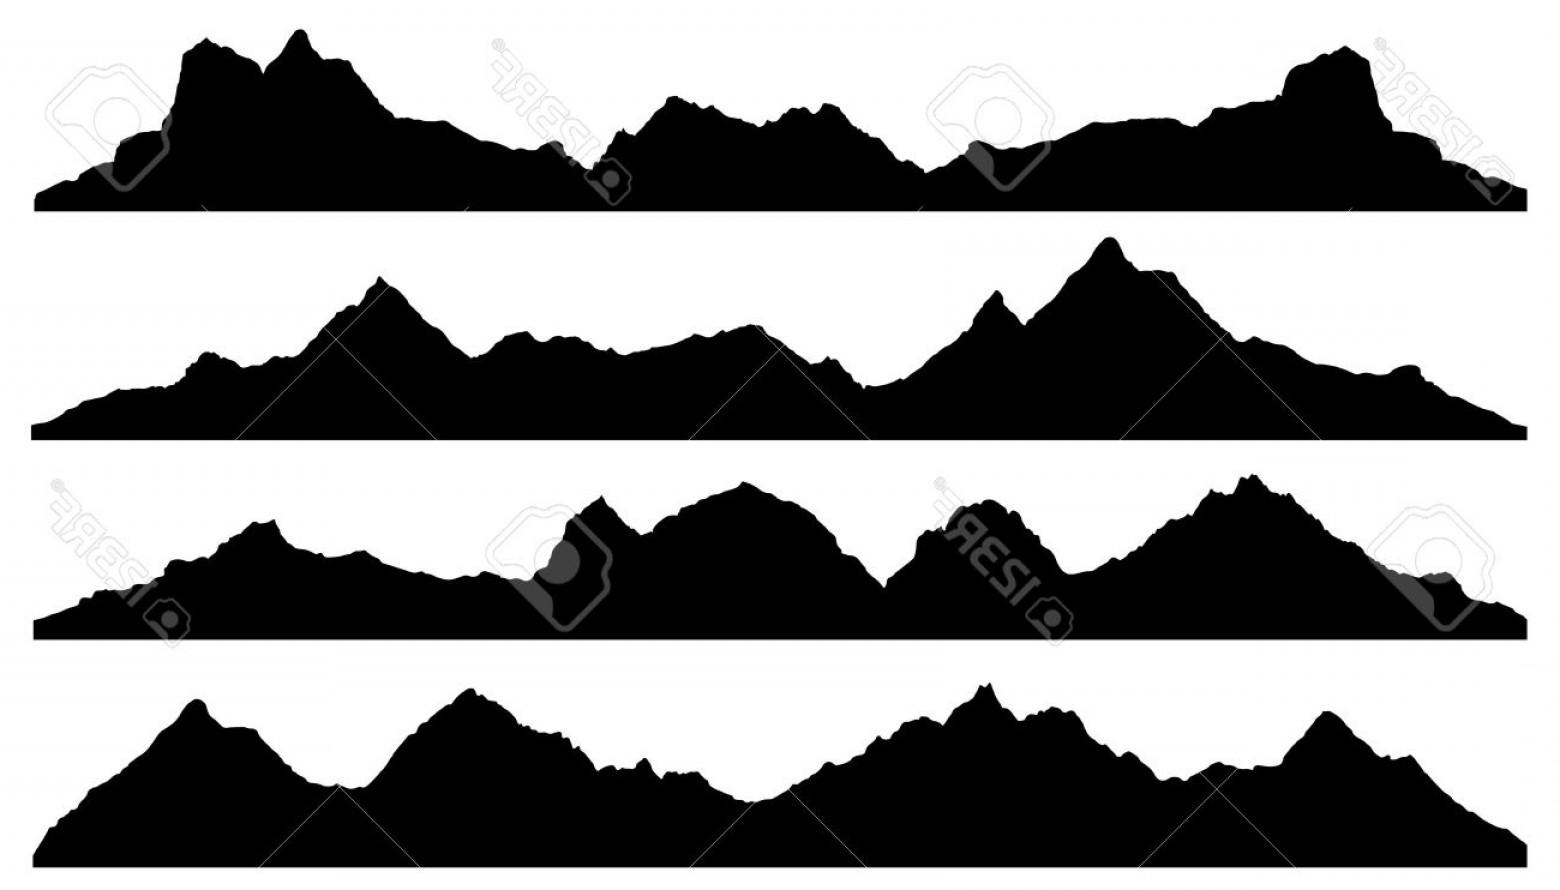 1560x890 Photostock Vector Mountain Silhouettes On The White Background